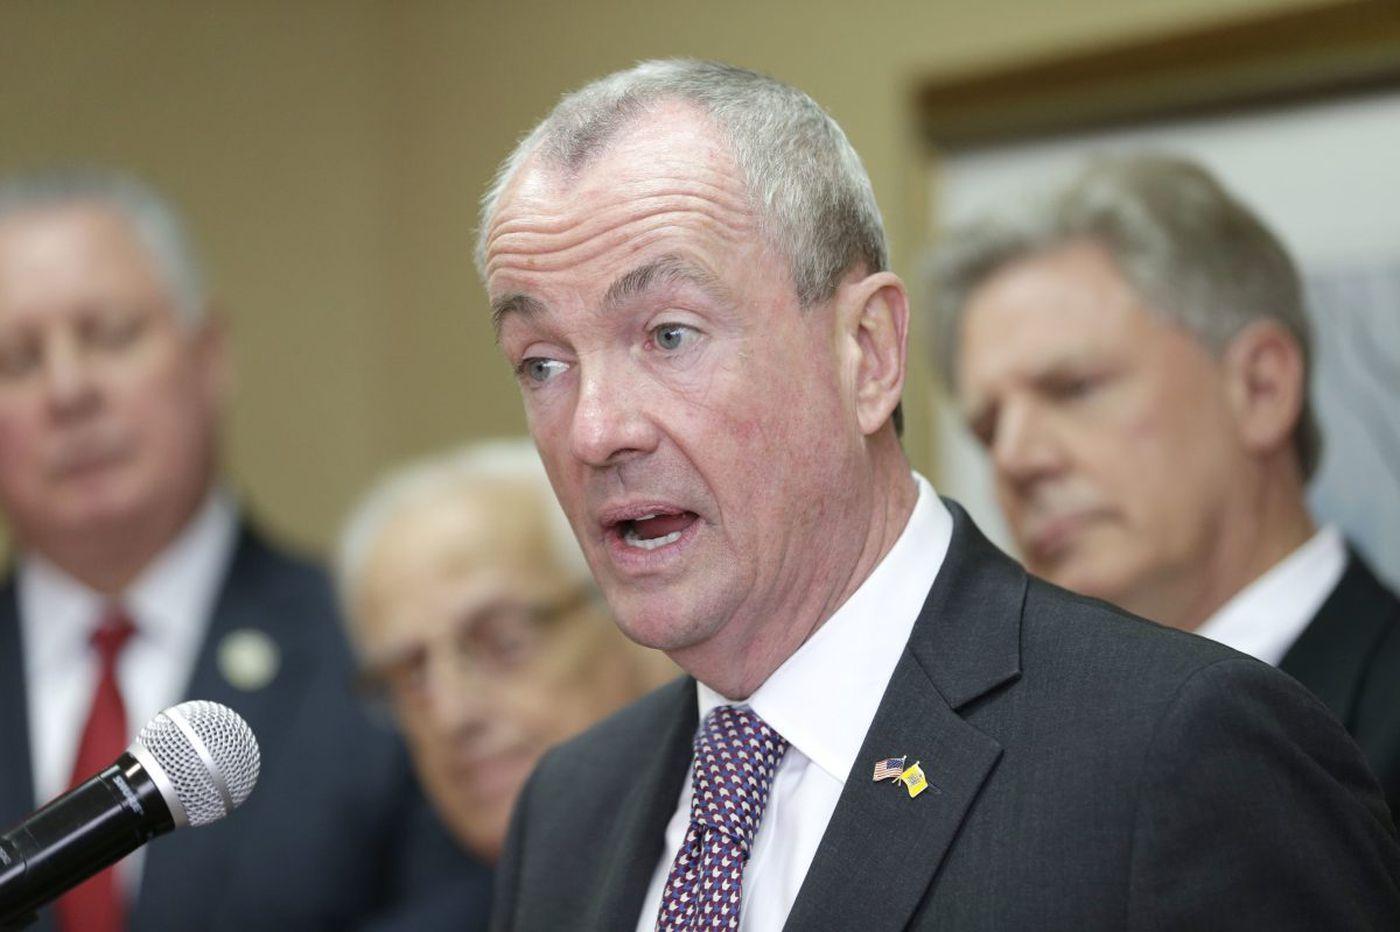 Phil Murphy's billion-dollar challenge: N.J. school funding